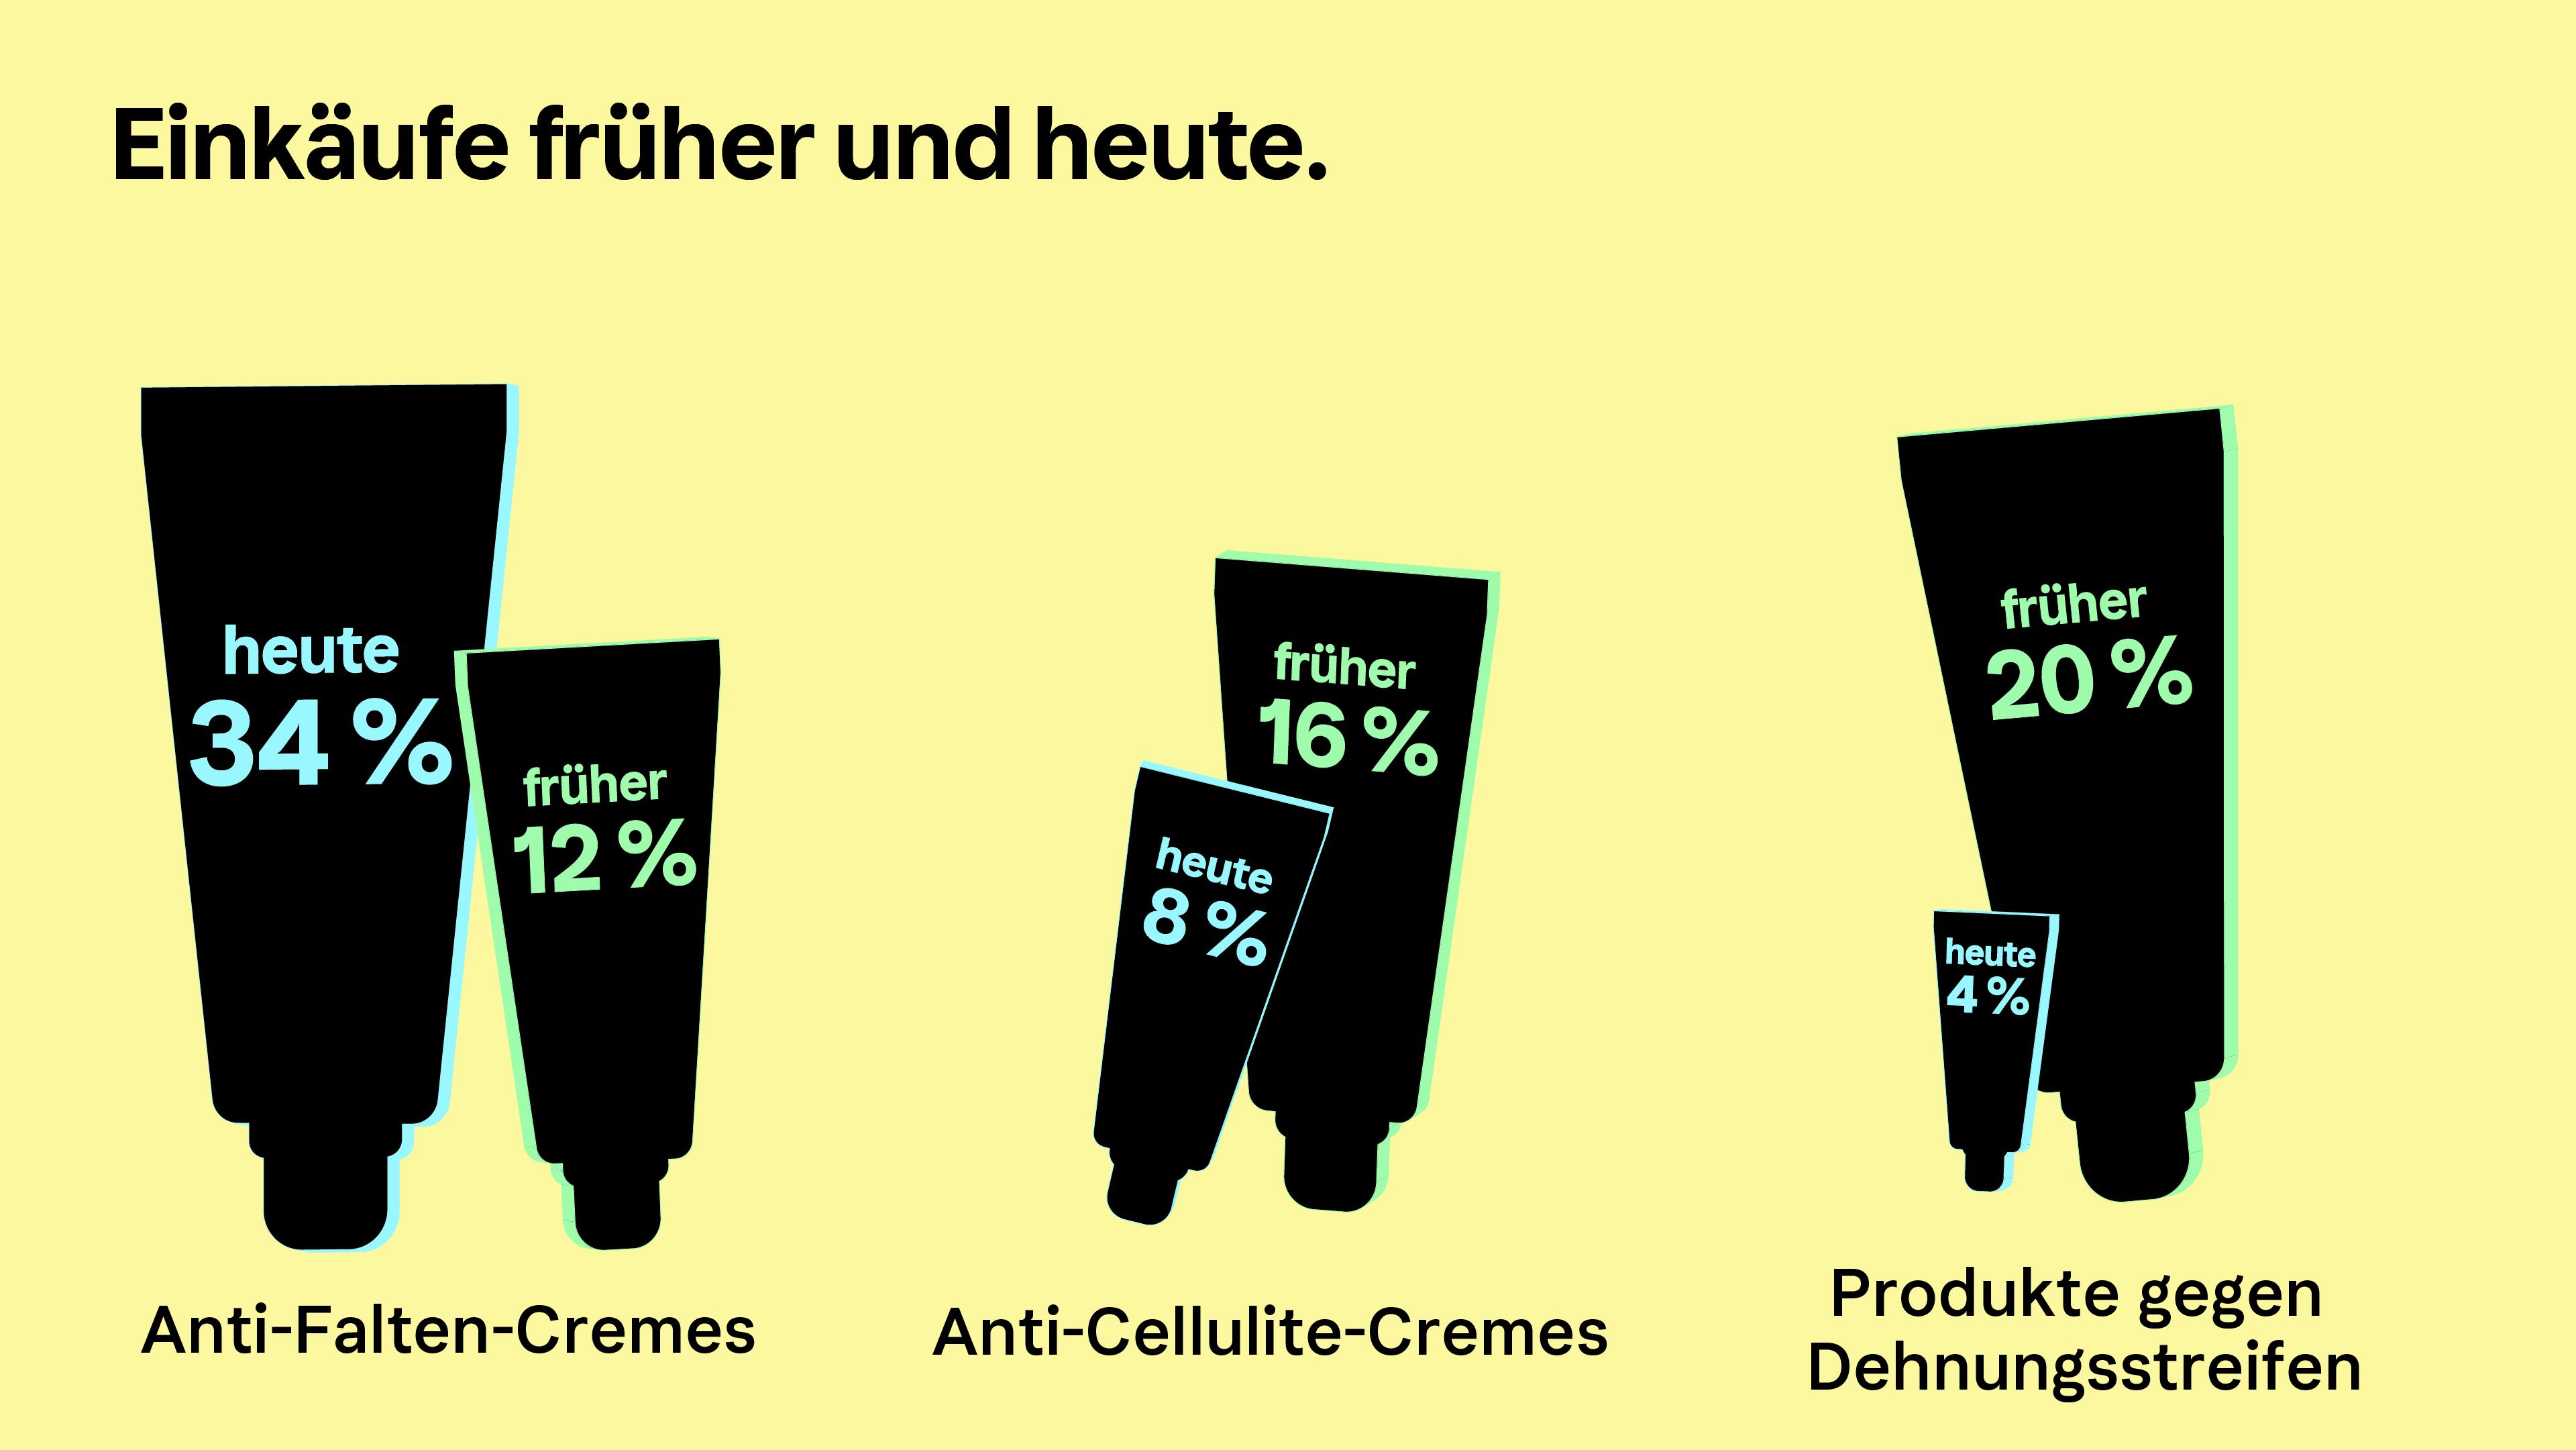 Infografik des Klarna Trendreport Beauty zum Thema Anti-Falten-Cremes